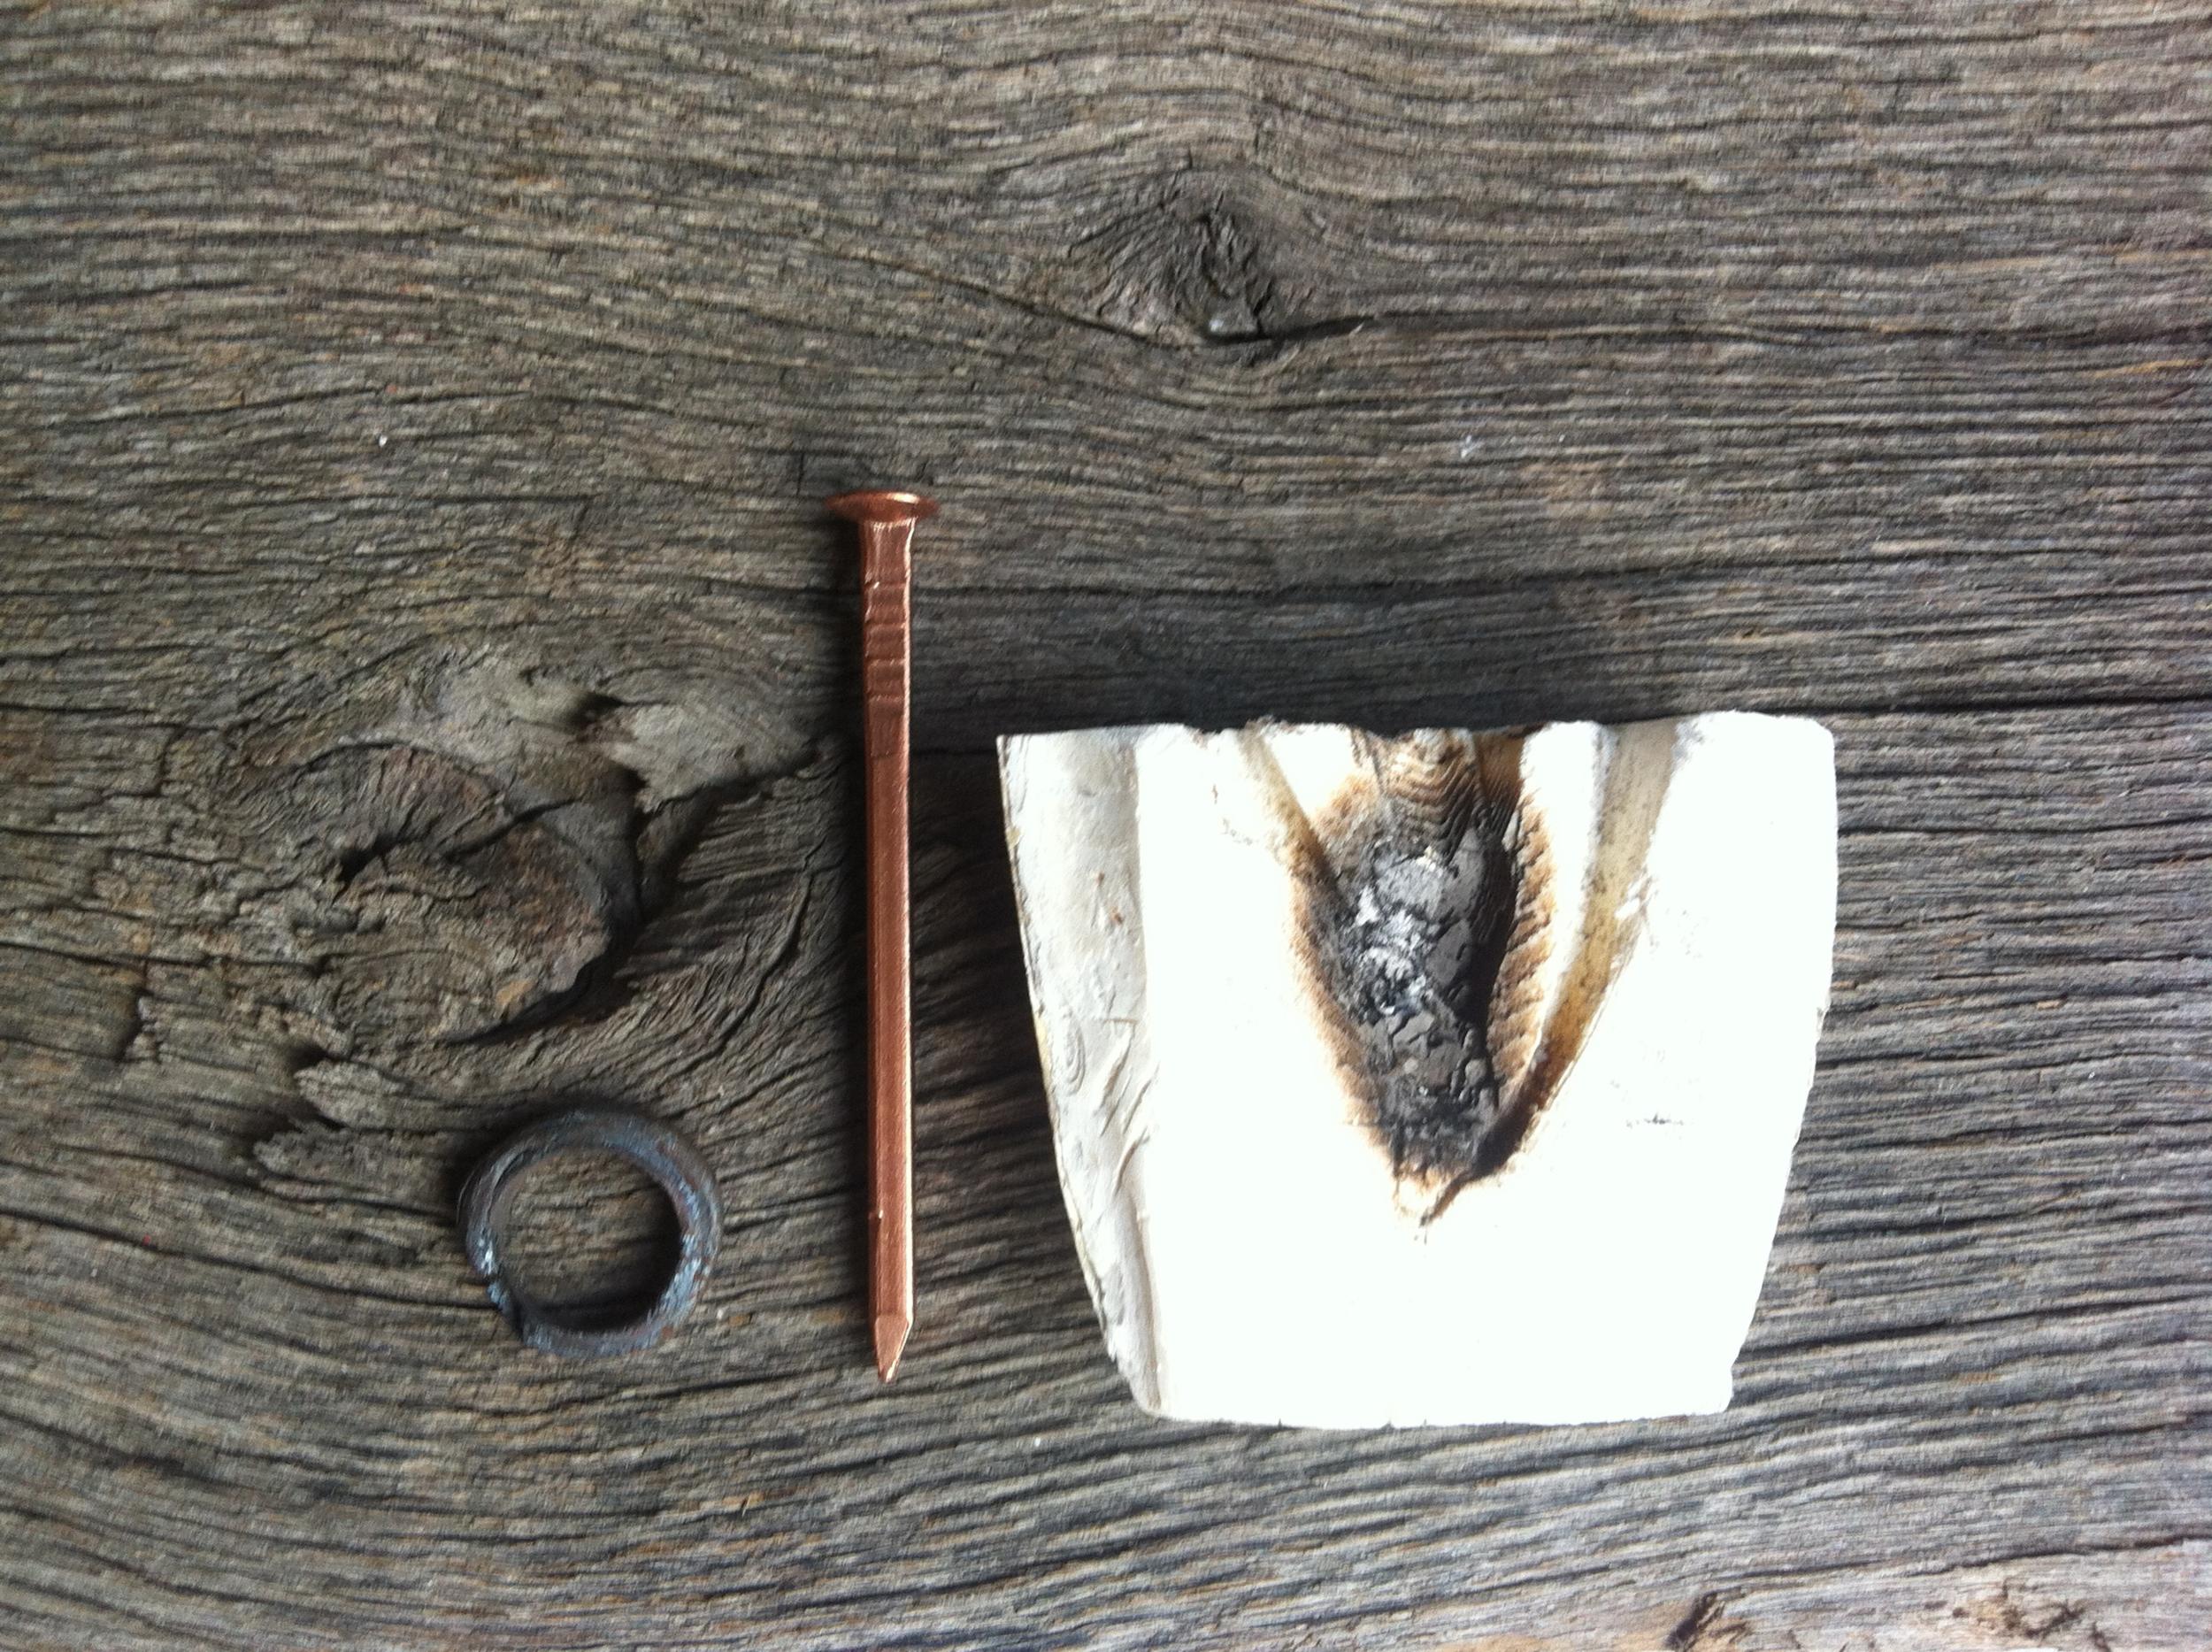 cuttlefish casting.JPG